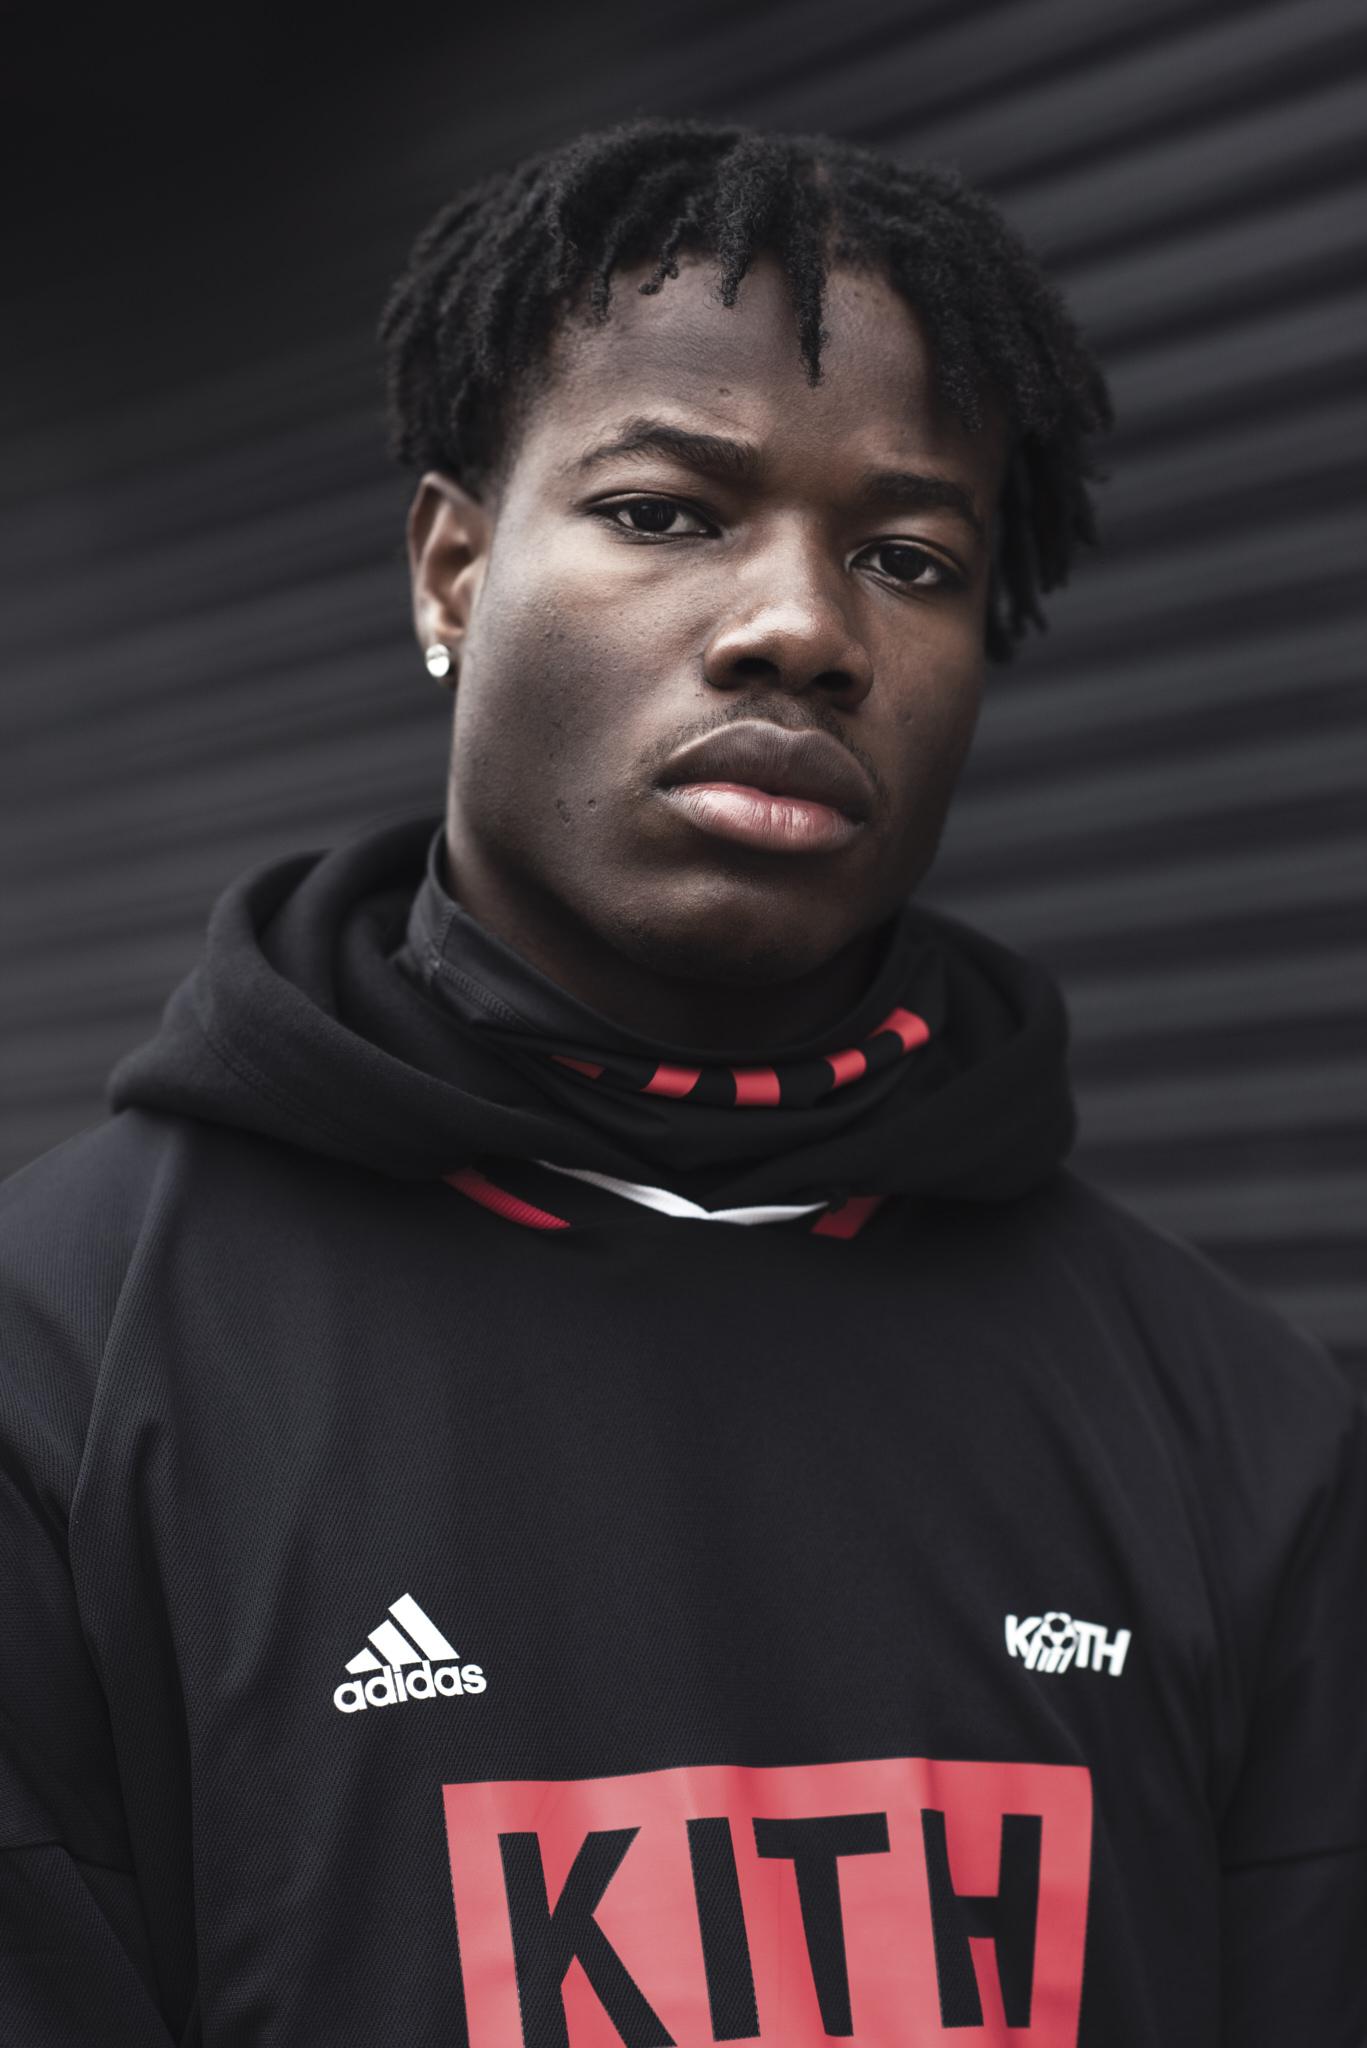 Glory by Nick Pecori Photographer Manchester United Adidas Kith Parley Miami 14.jpg